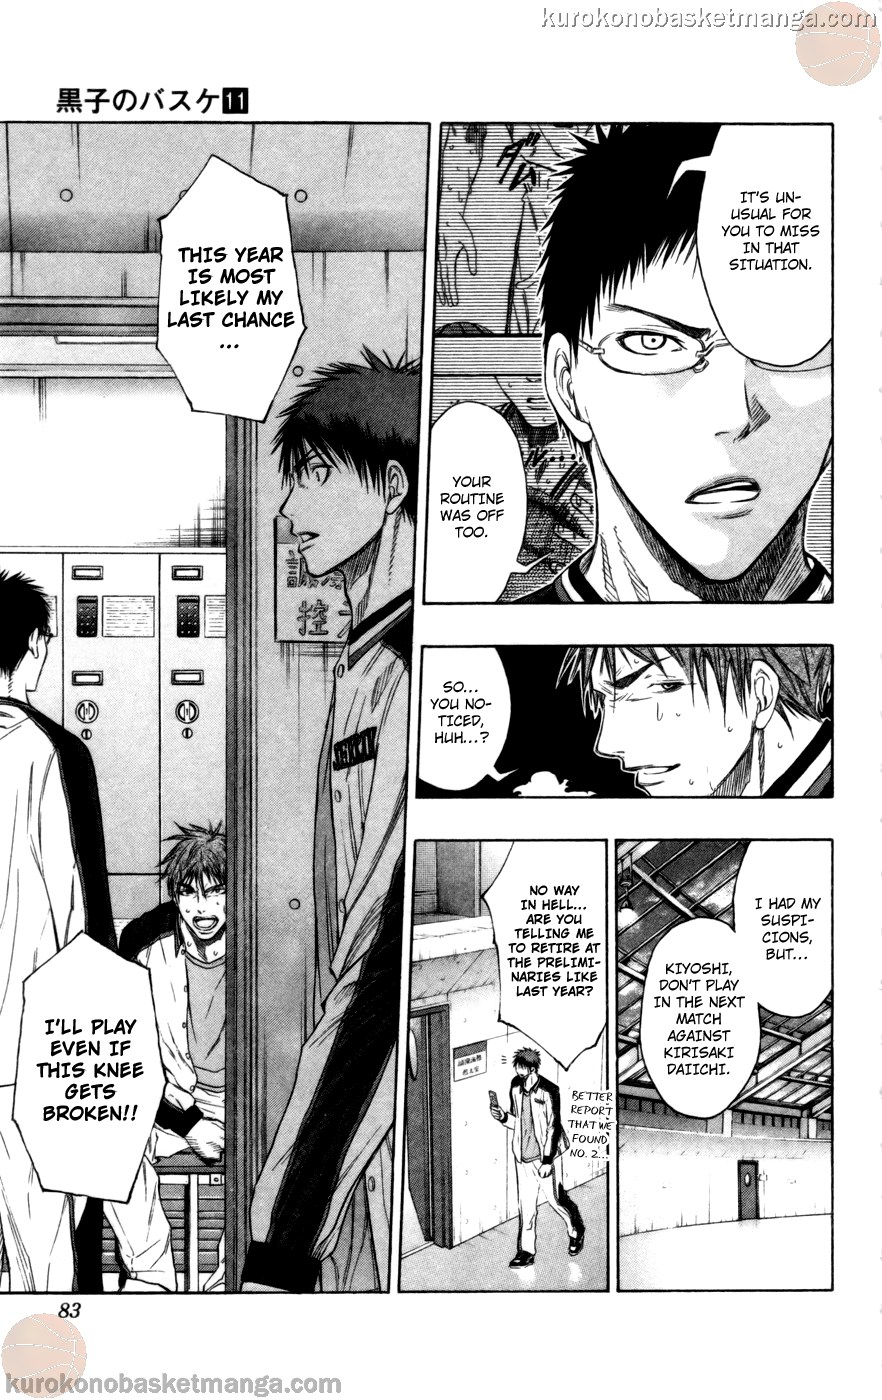 Kuroko no Basket Manga Chapter 93 - Image 19